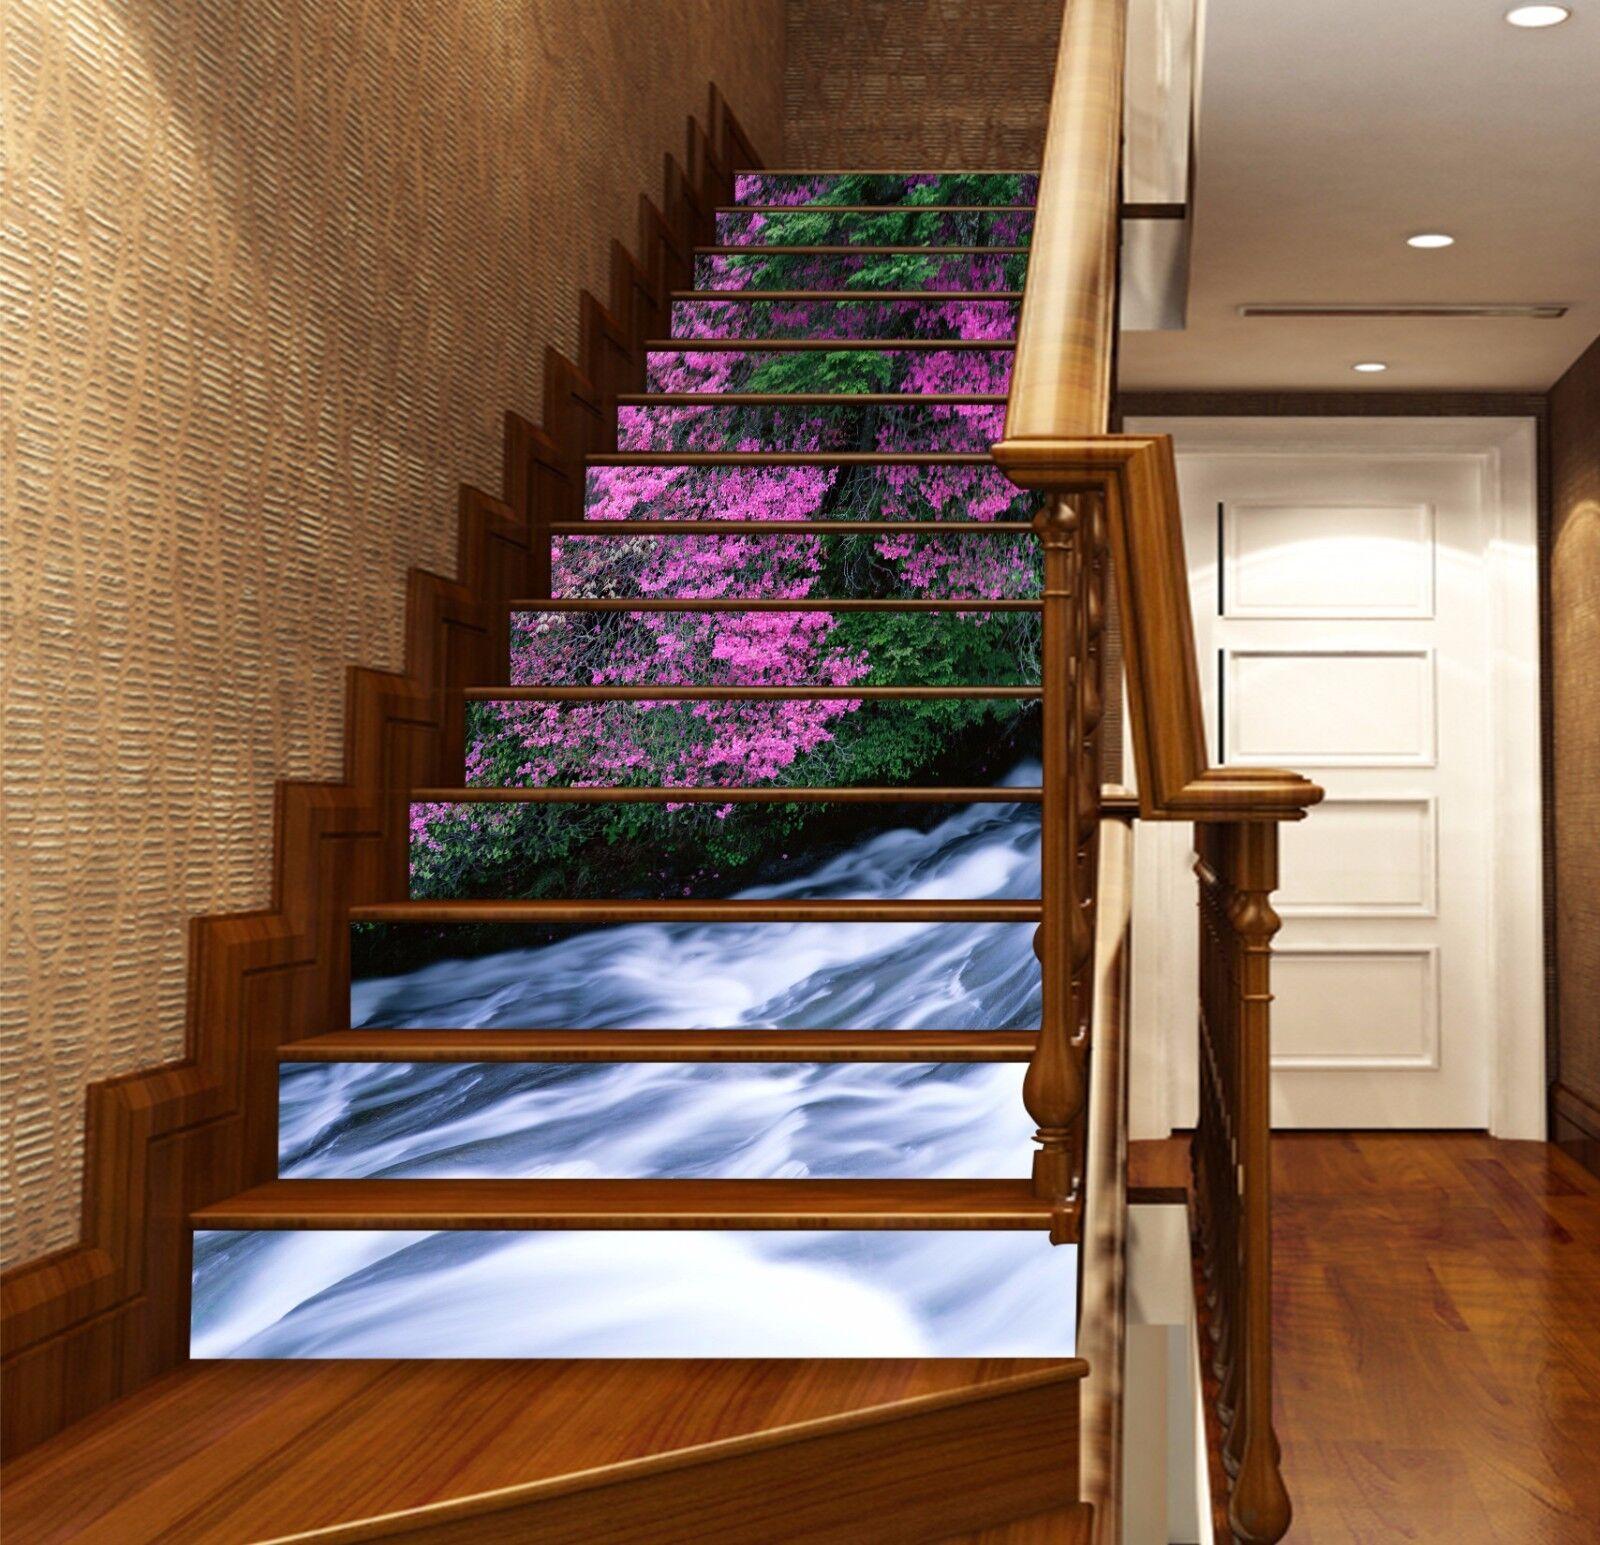 3D Waterfall Flower 4634 Risers Decoration Photo Mural Vinyl Decal Wallpaper CA